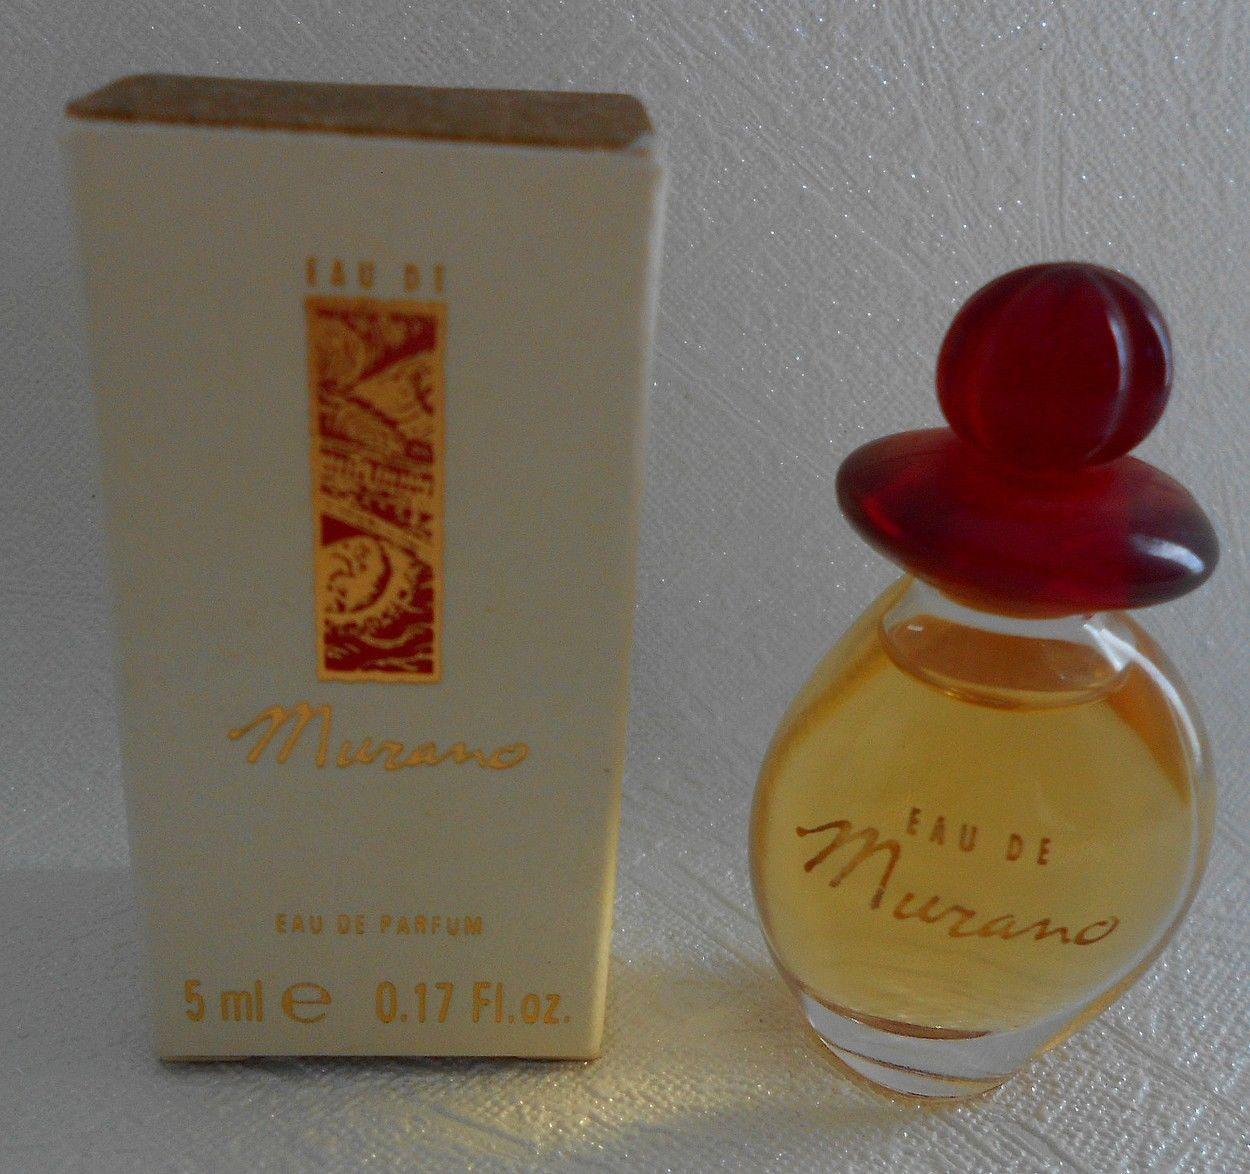 rare miniature de parfum eau de murano edp 5 ml collections parfums miniatures ebay. Black Bedroom Furniture Sets. Home Design Ideas